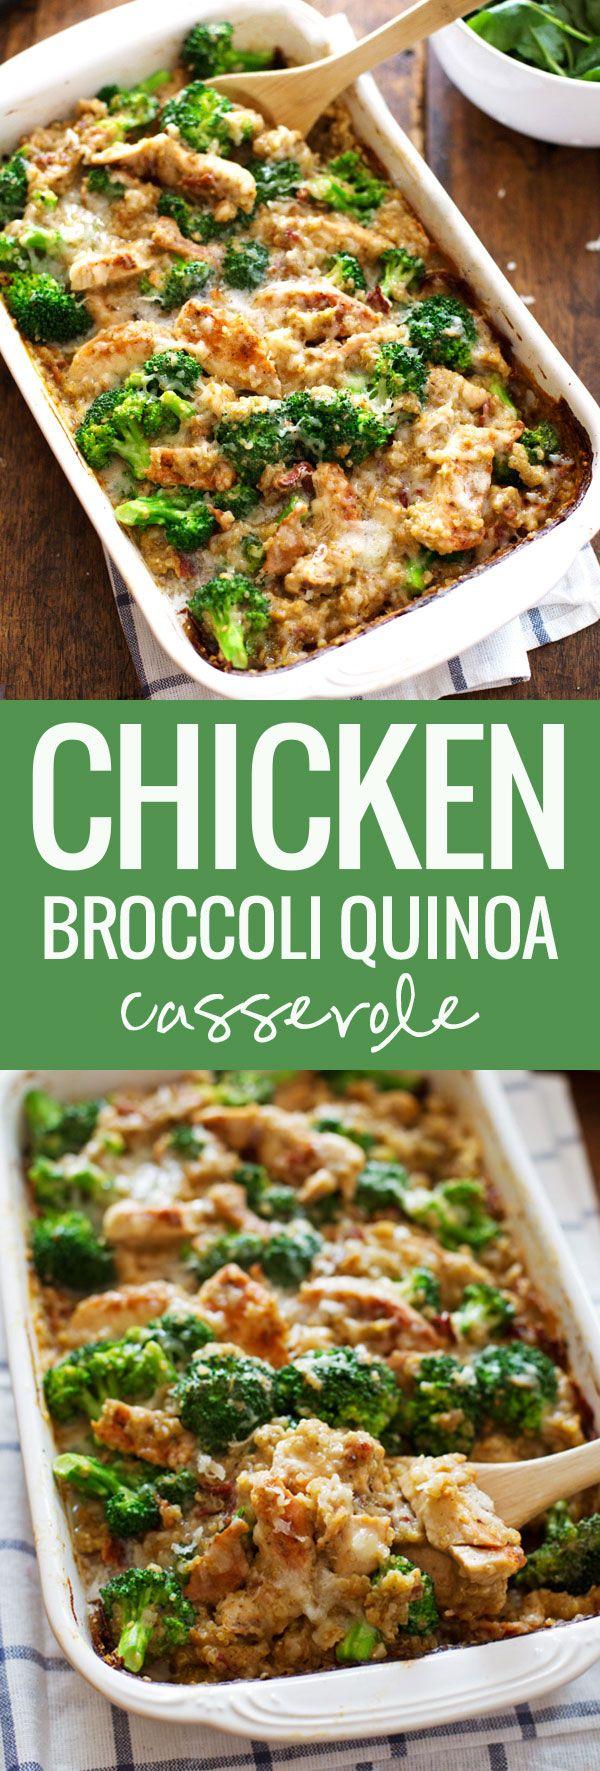 Creamy Chicken Quinoa and Broccoli Casserole - real food meets comfort food.